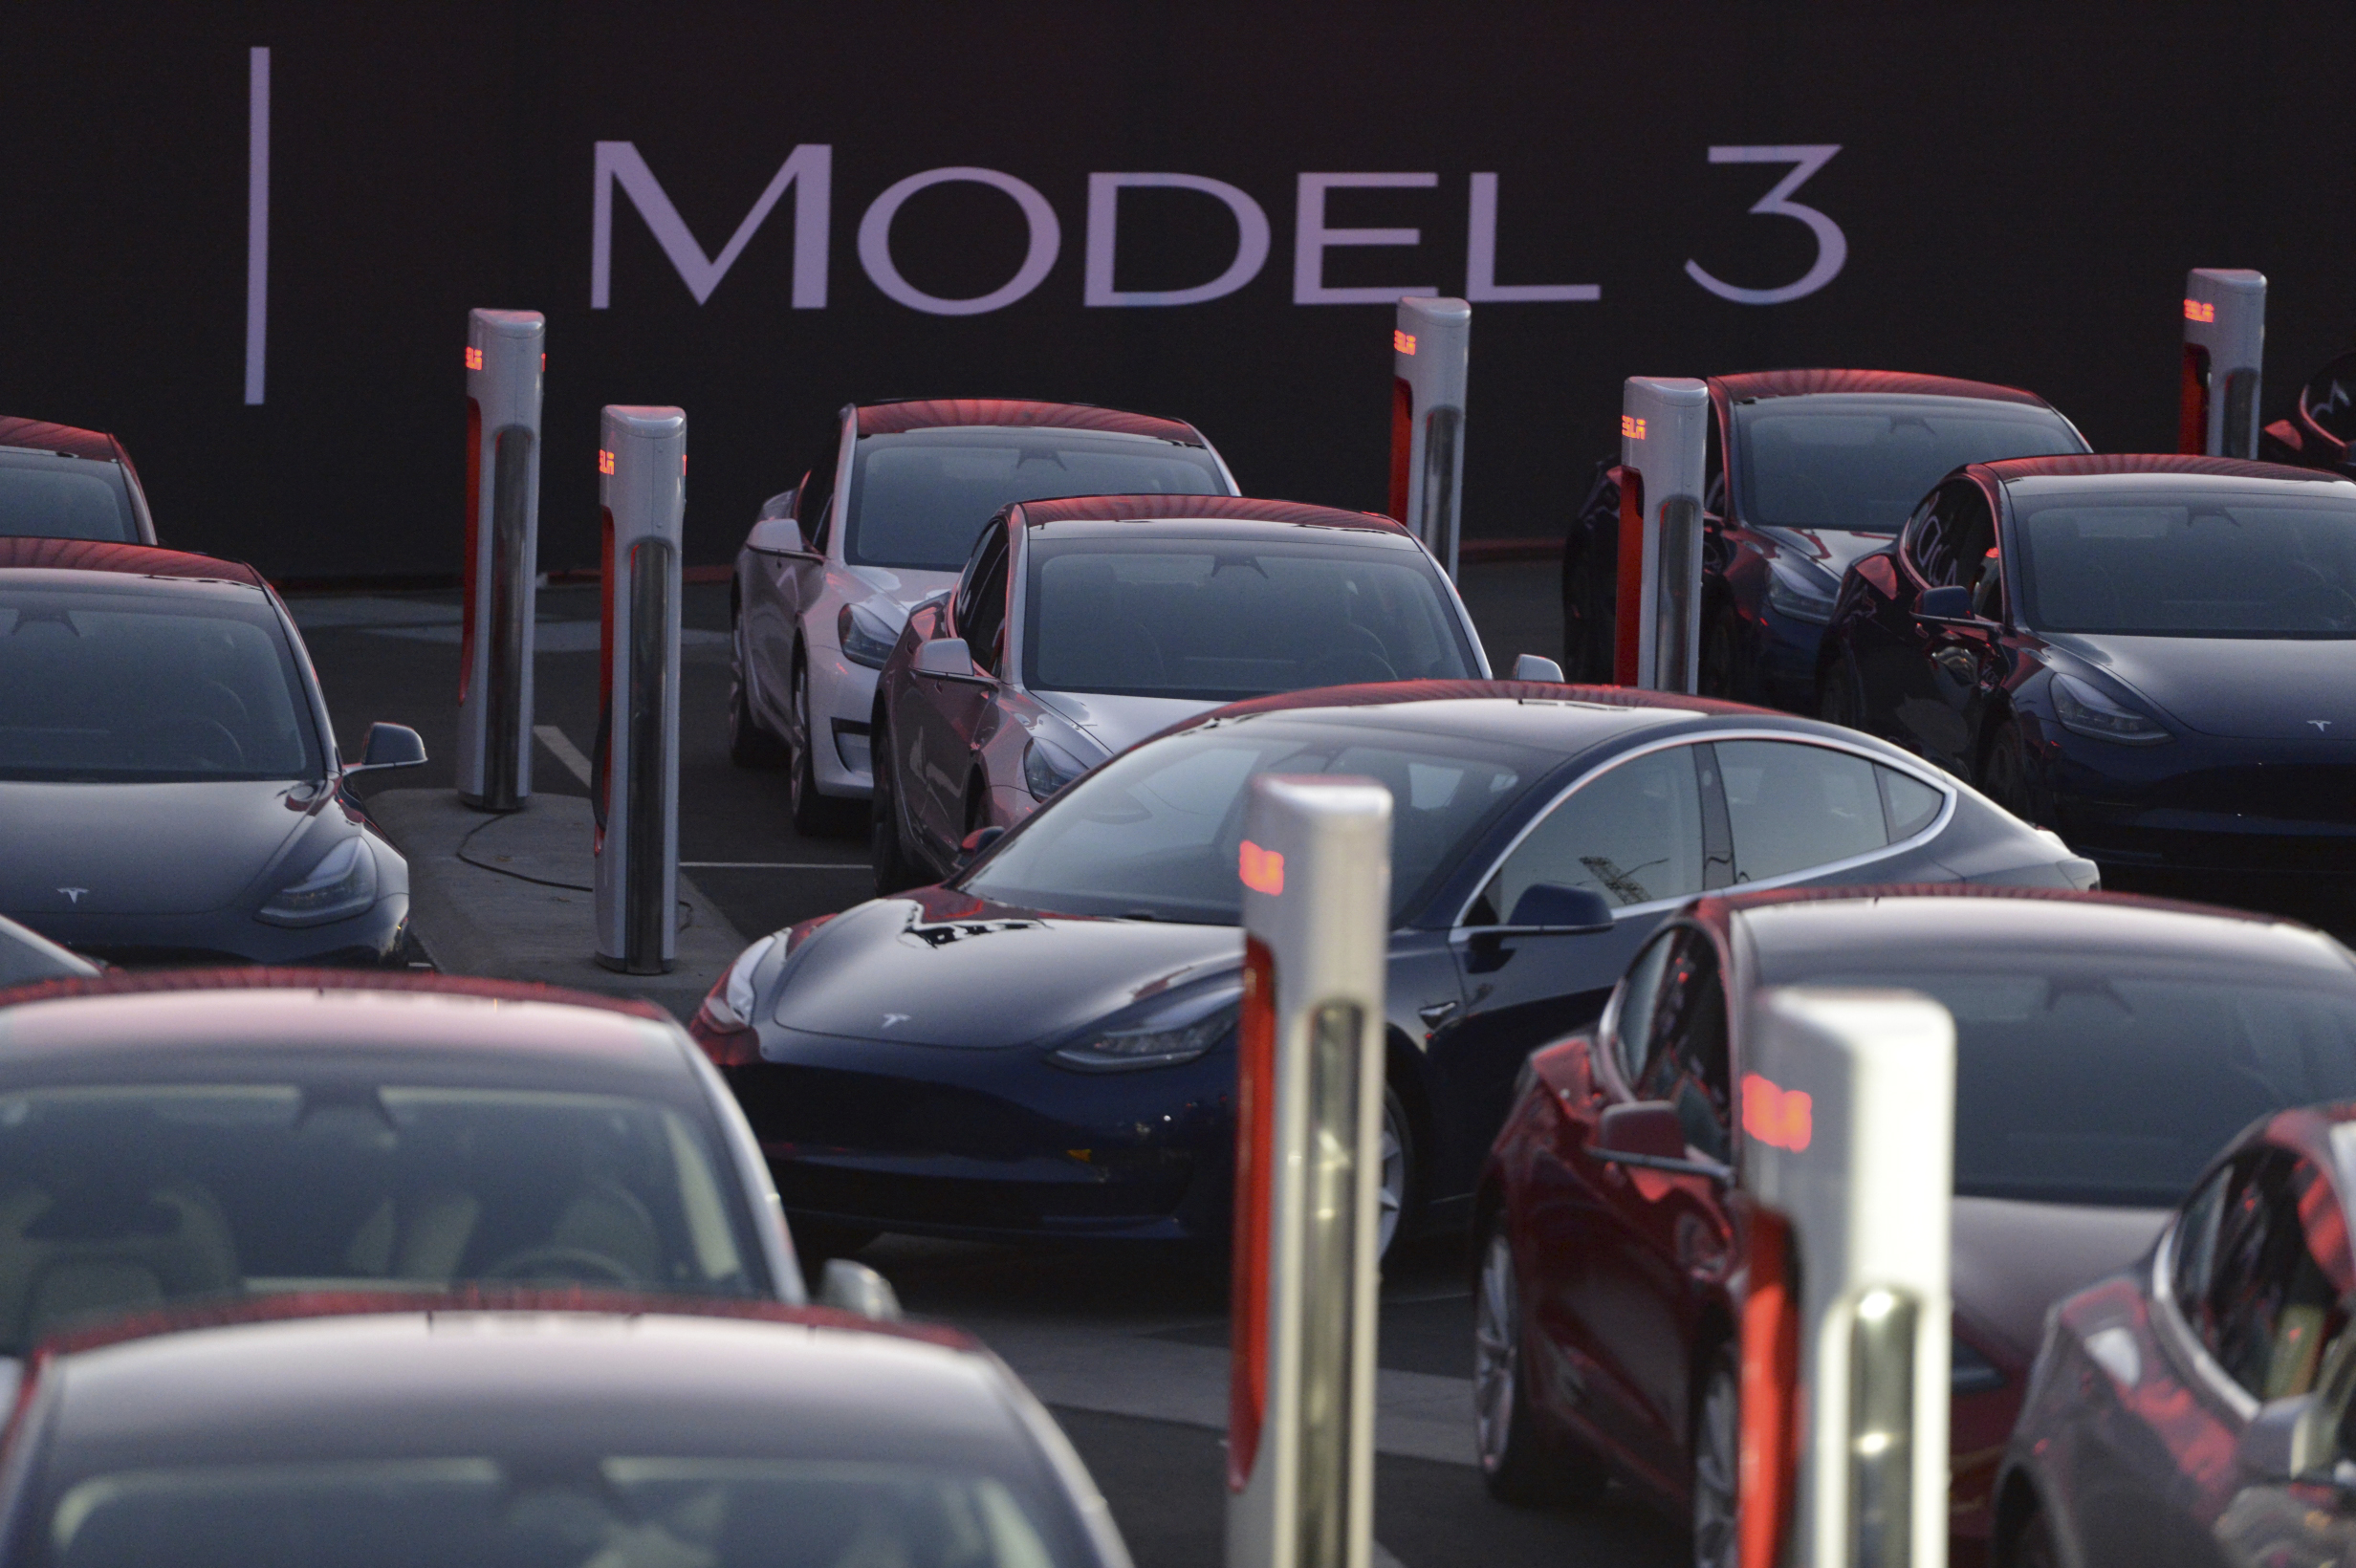 Vorstellung des Tesla-Fahrzeugs Model 3